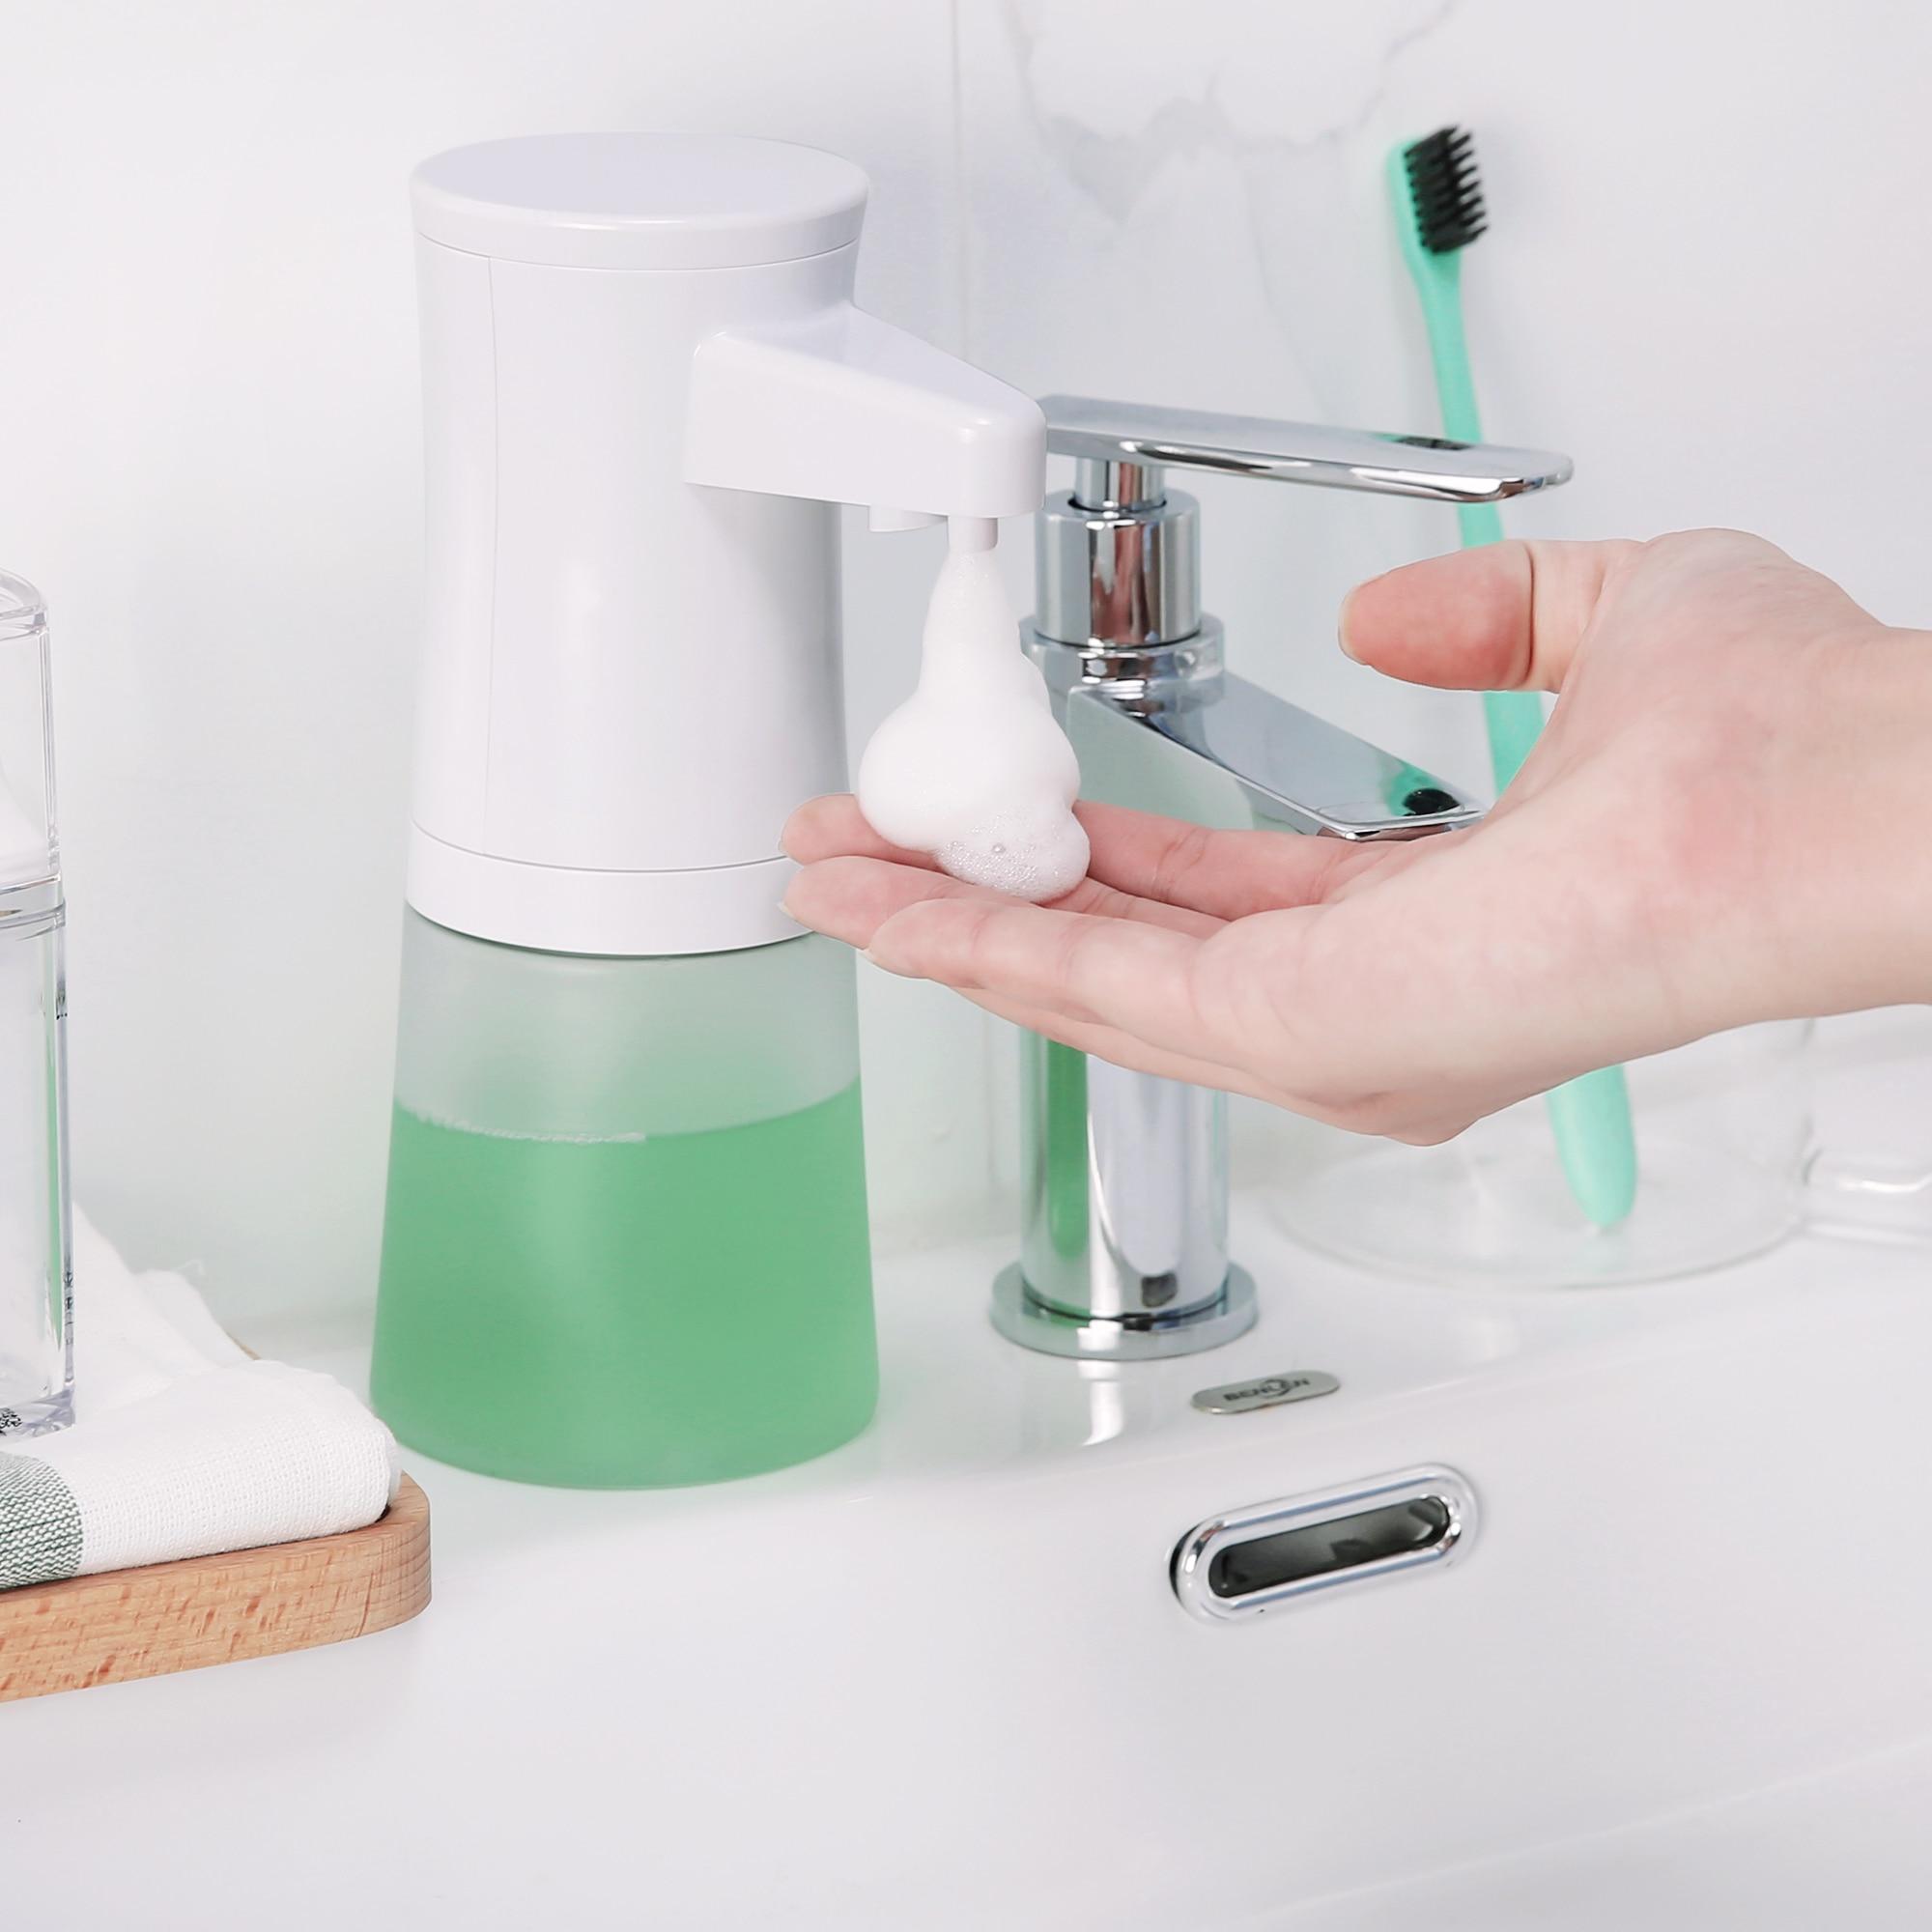 350ML Smart Automatic Foam Soap Dispenser Infrared Sensing Shampoo Shower Gel Universal Touchless Portable Liquid Soap Dispenser